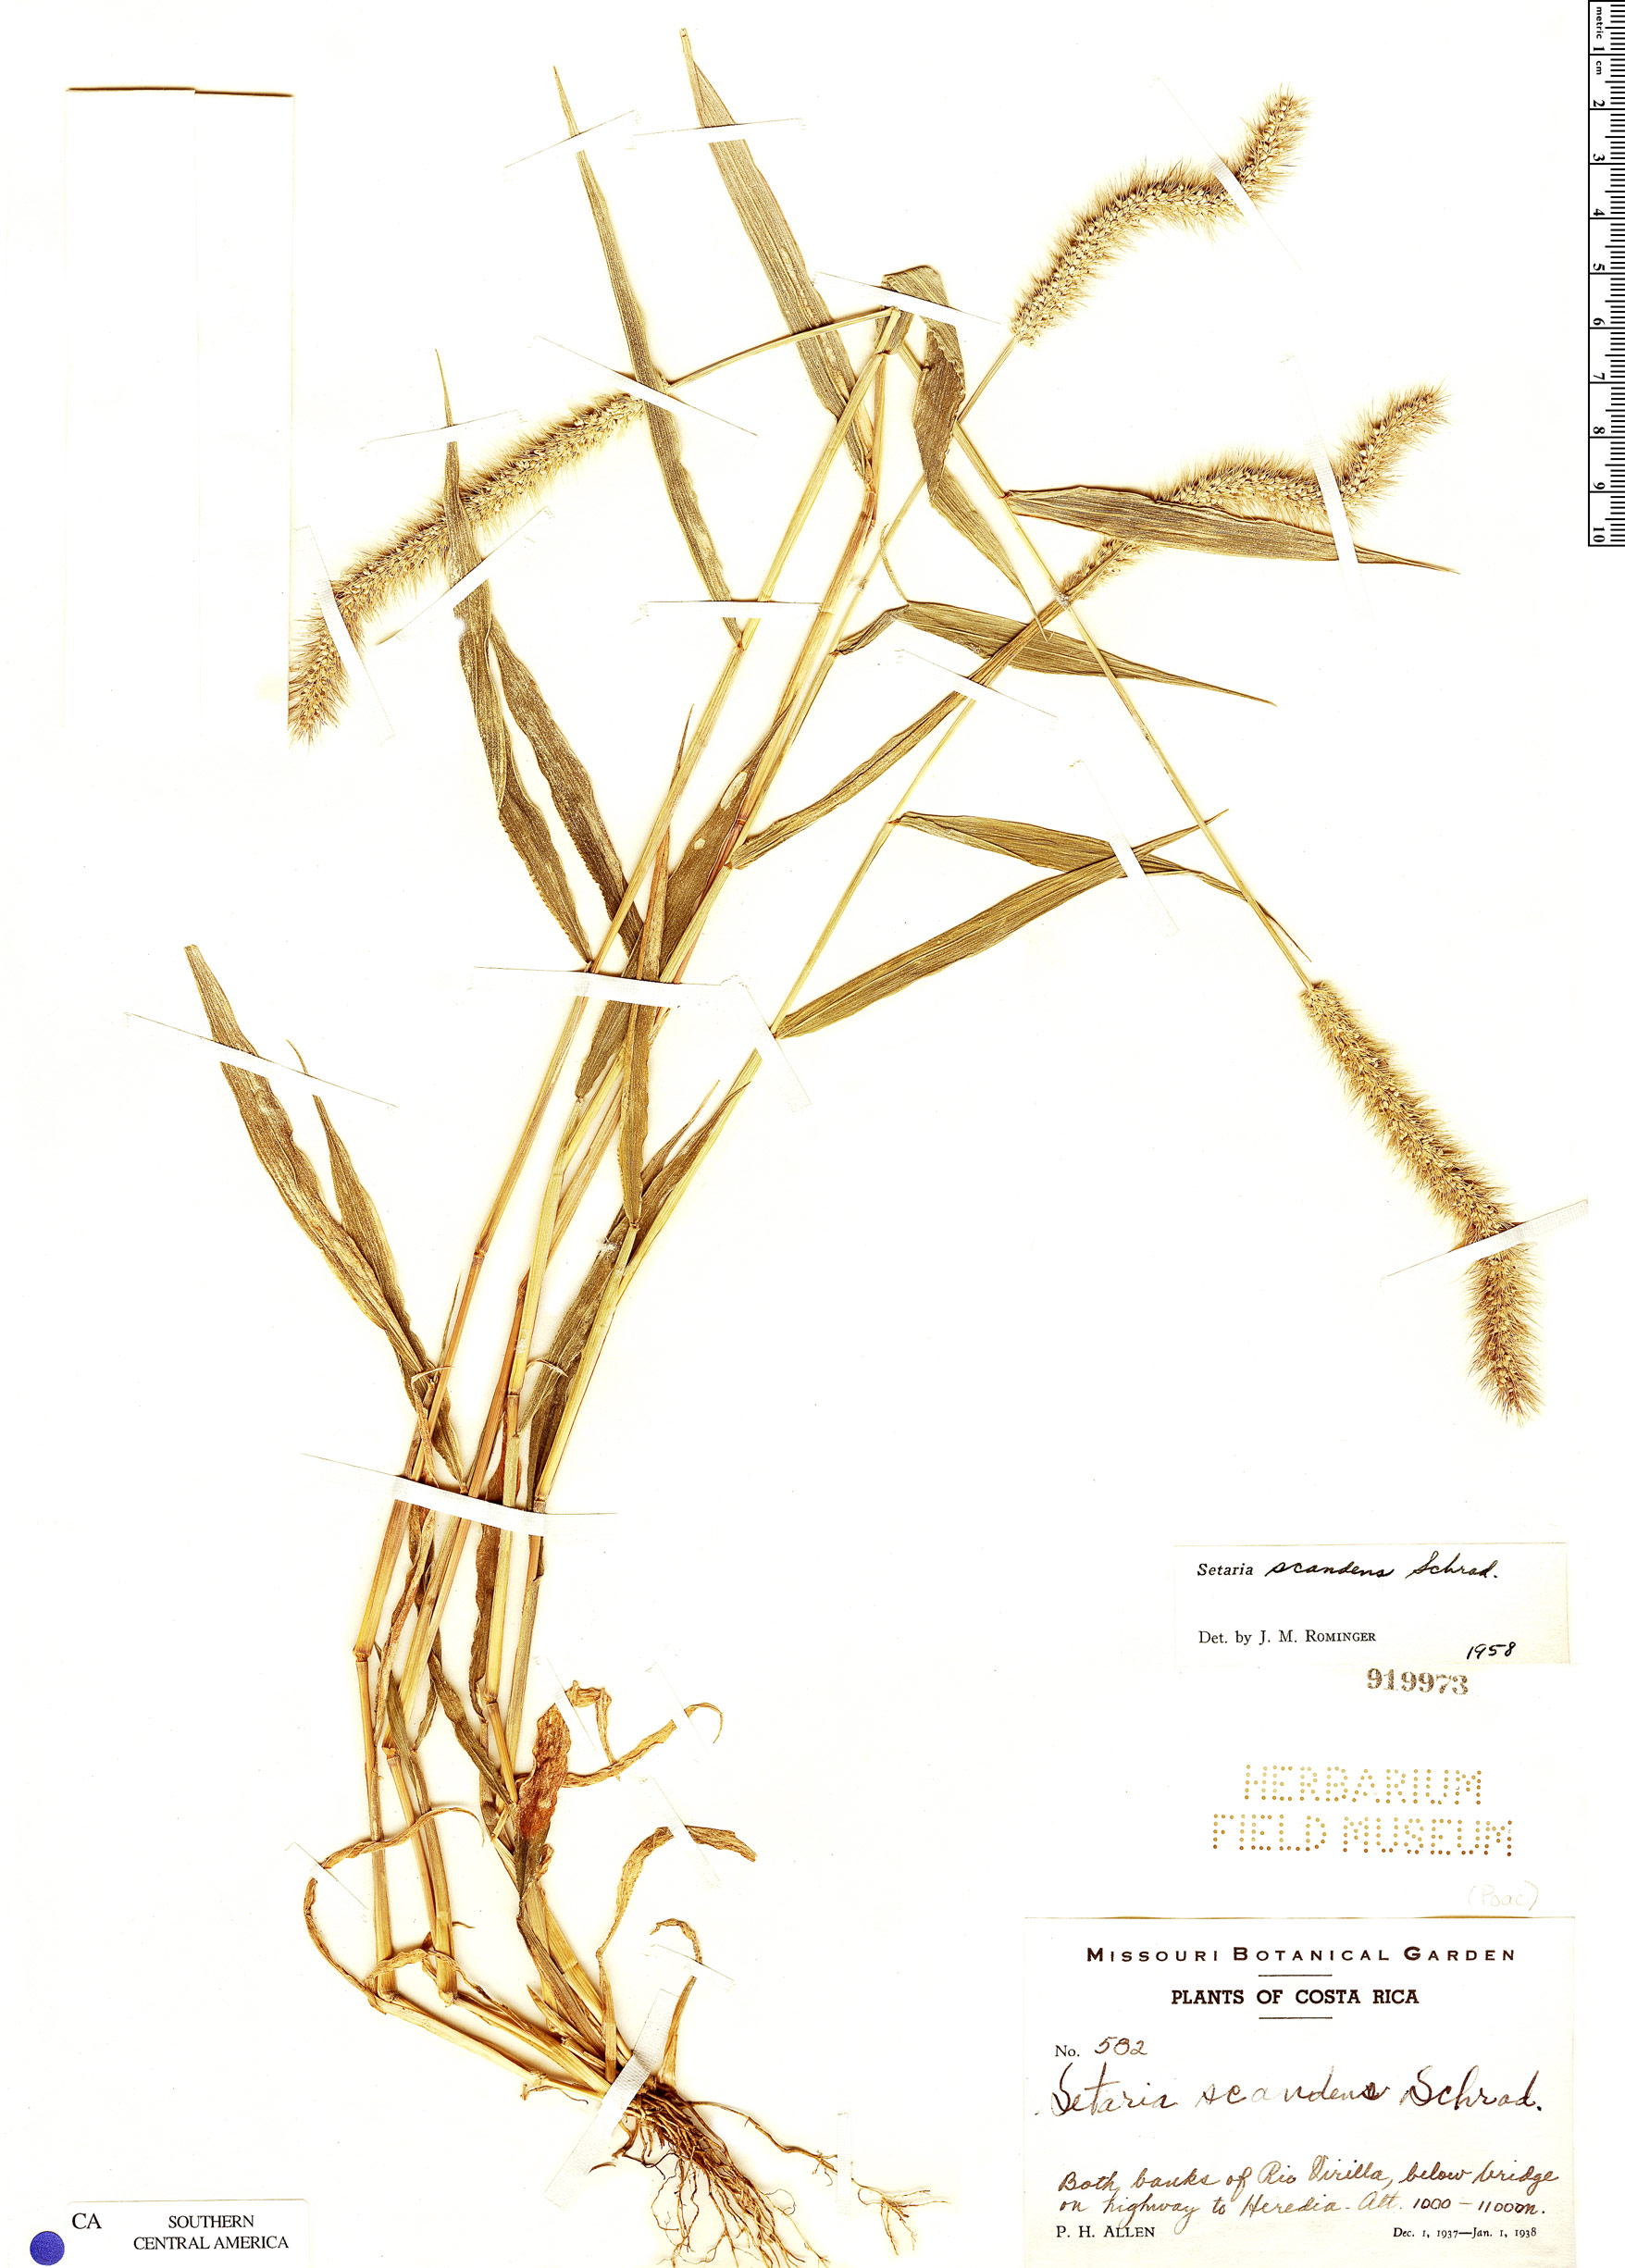 Specimen: Setaria scandens